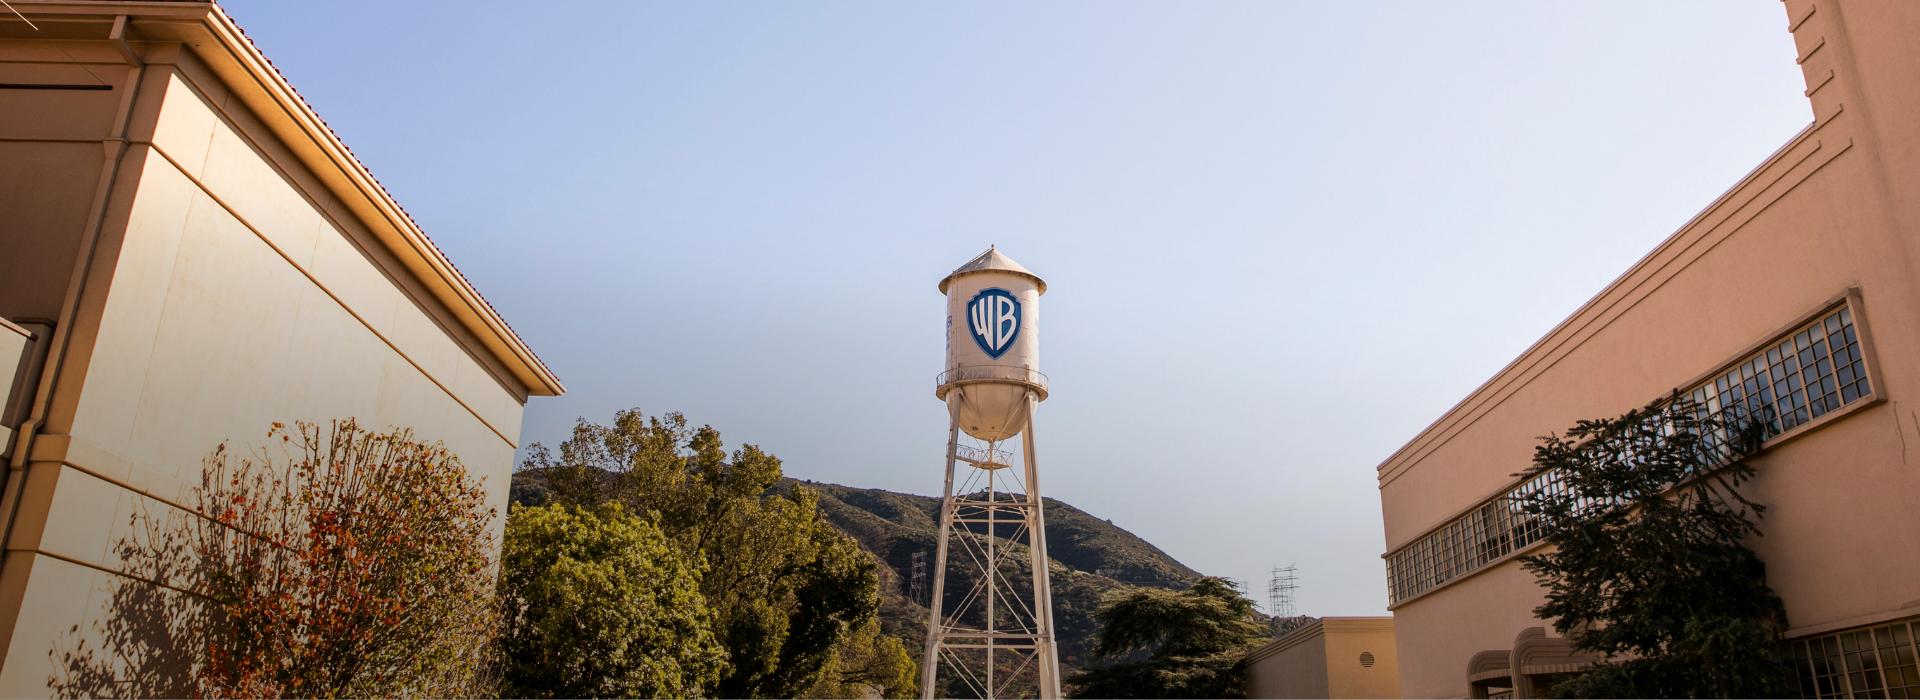 Warner Bros. Studio Lot